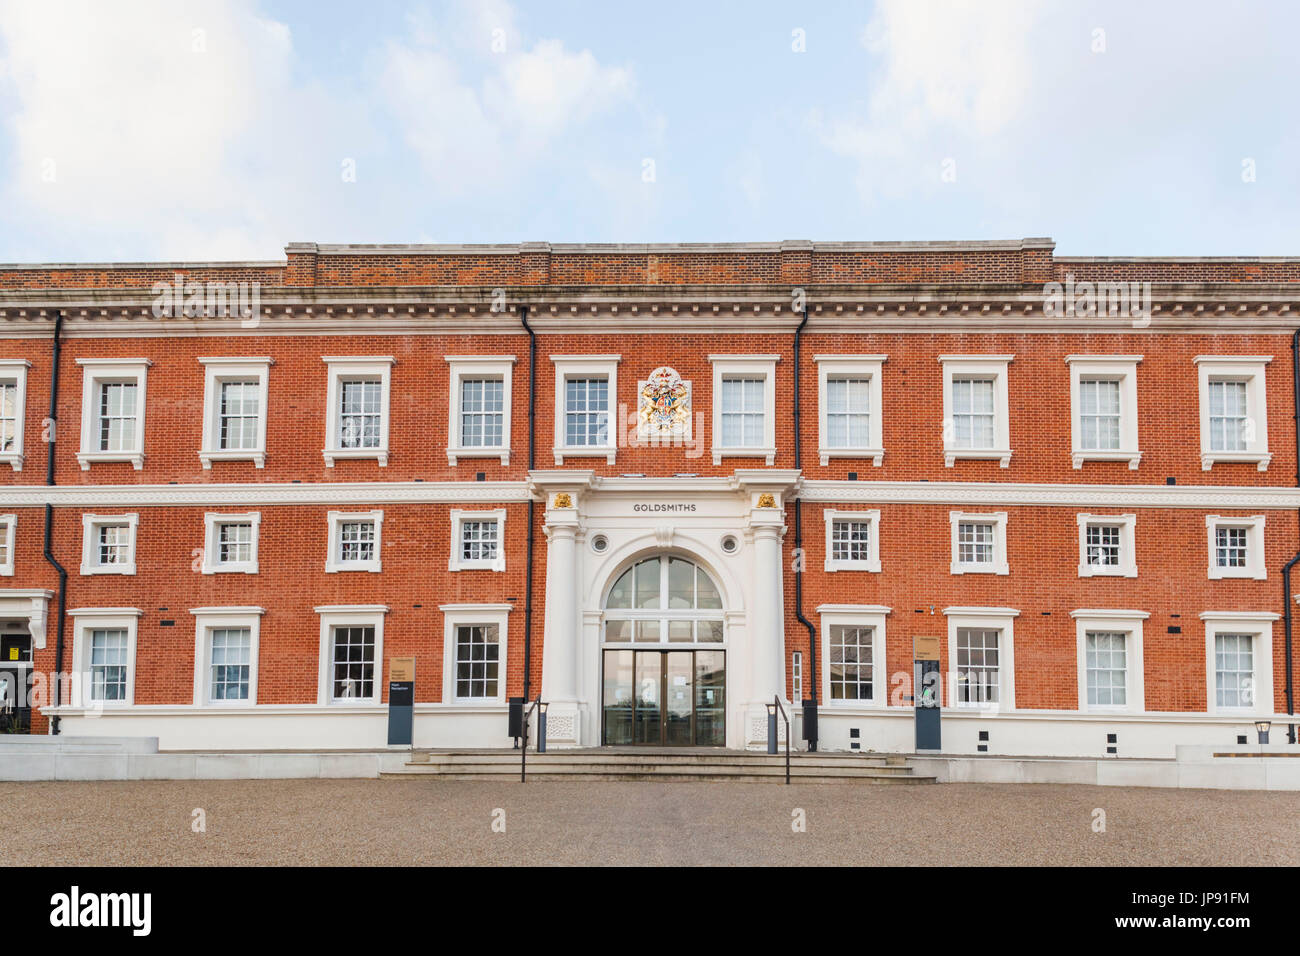 England, London, New Cross, Goldsmiths College - Stock Image